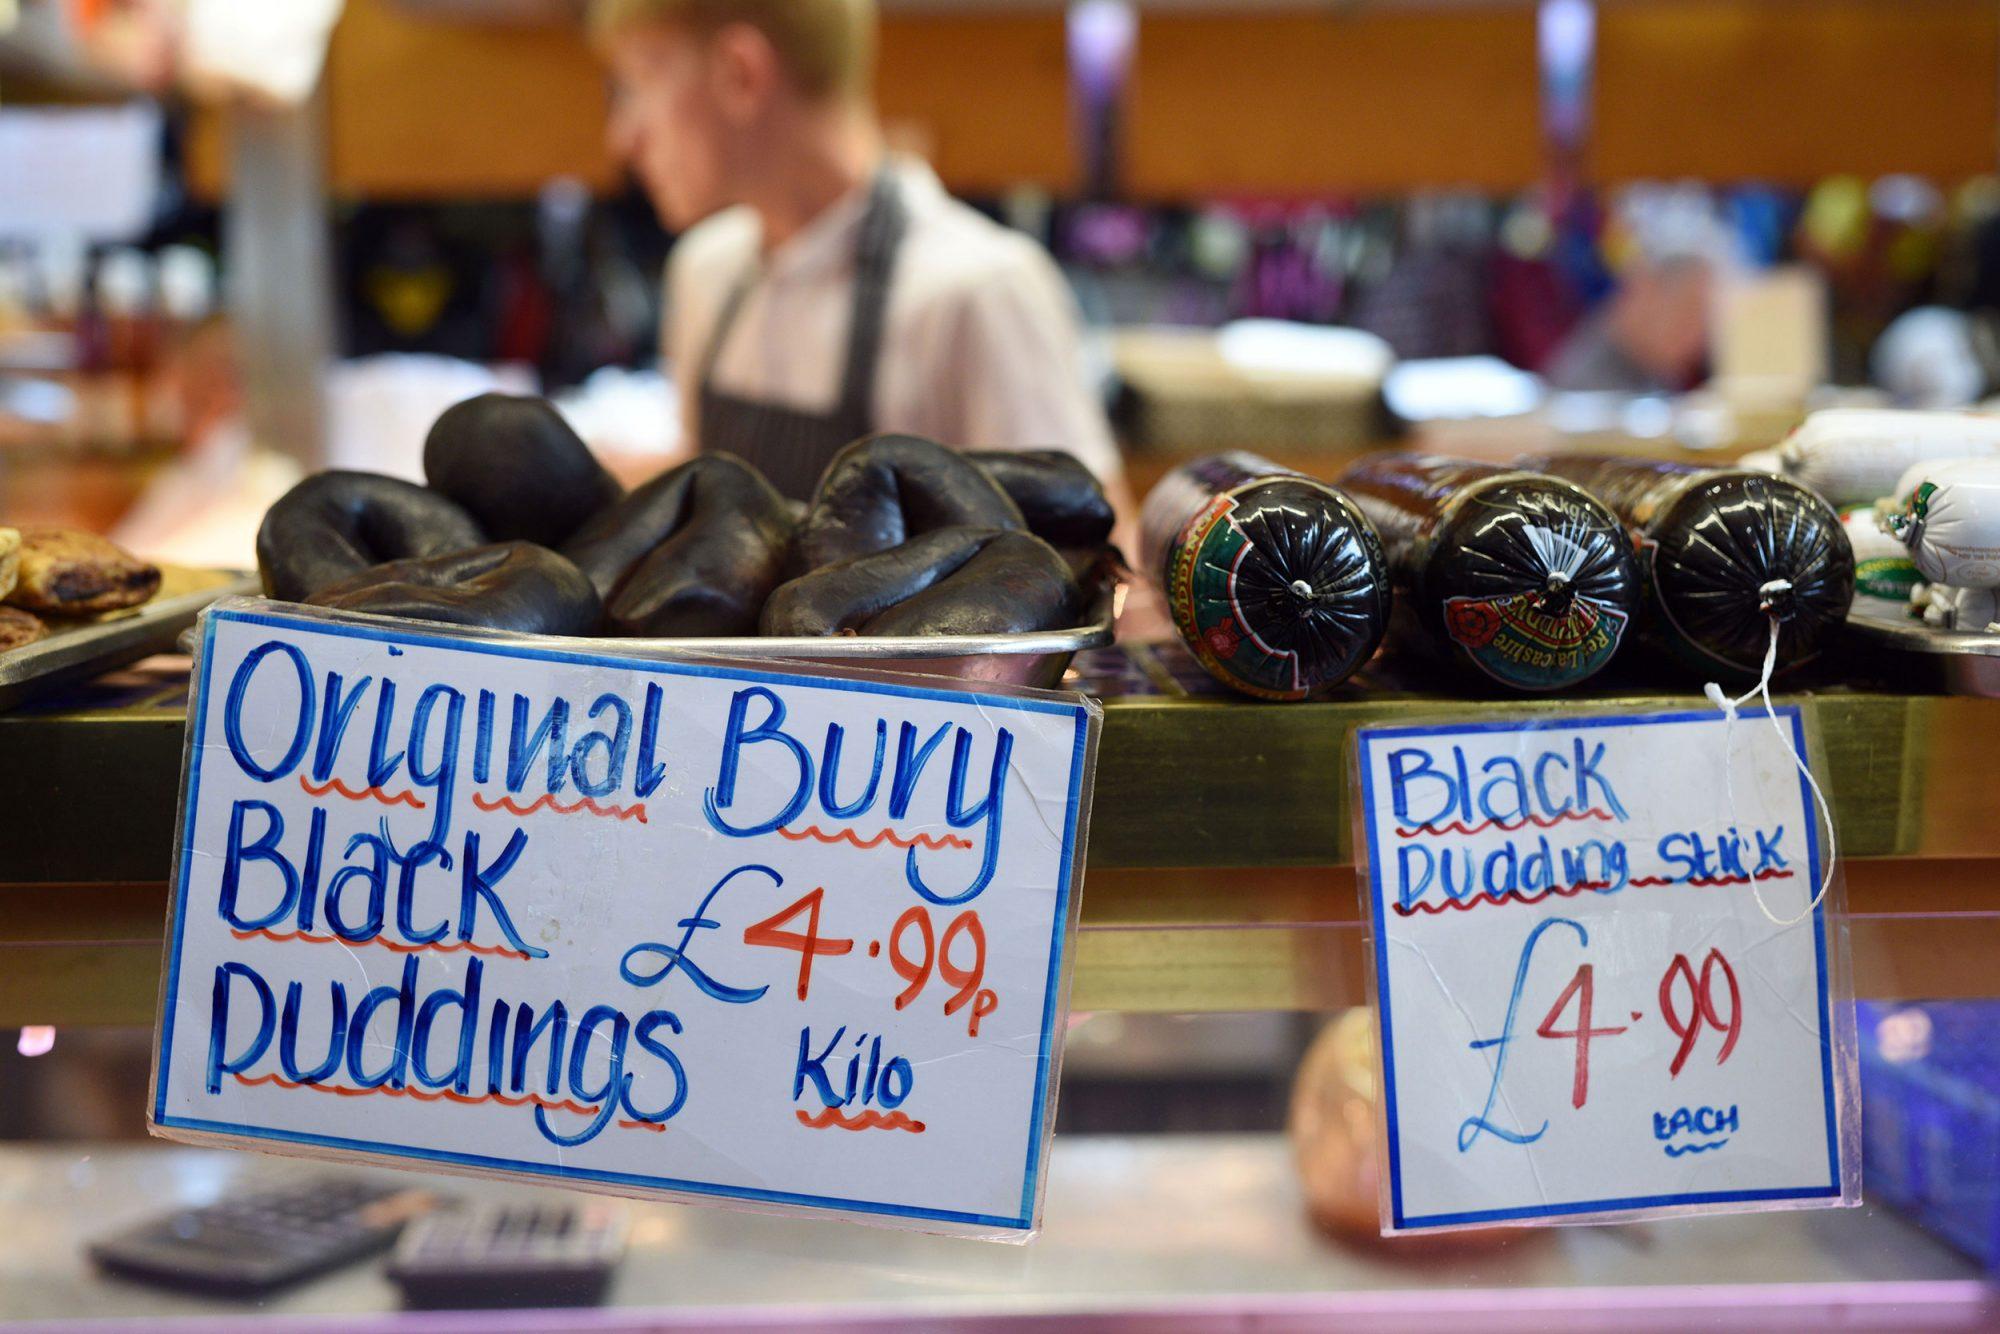 EC: In Praise of Black Pudding, the Bloodiest Breakfast Food